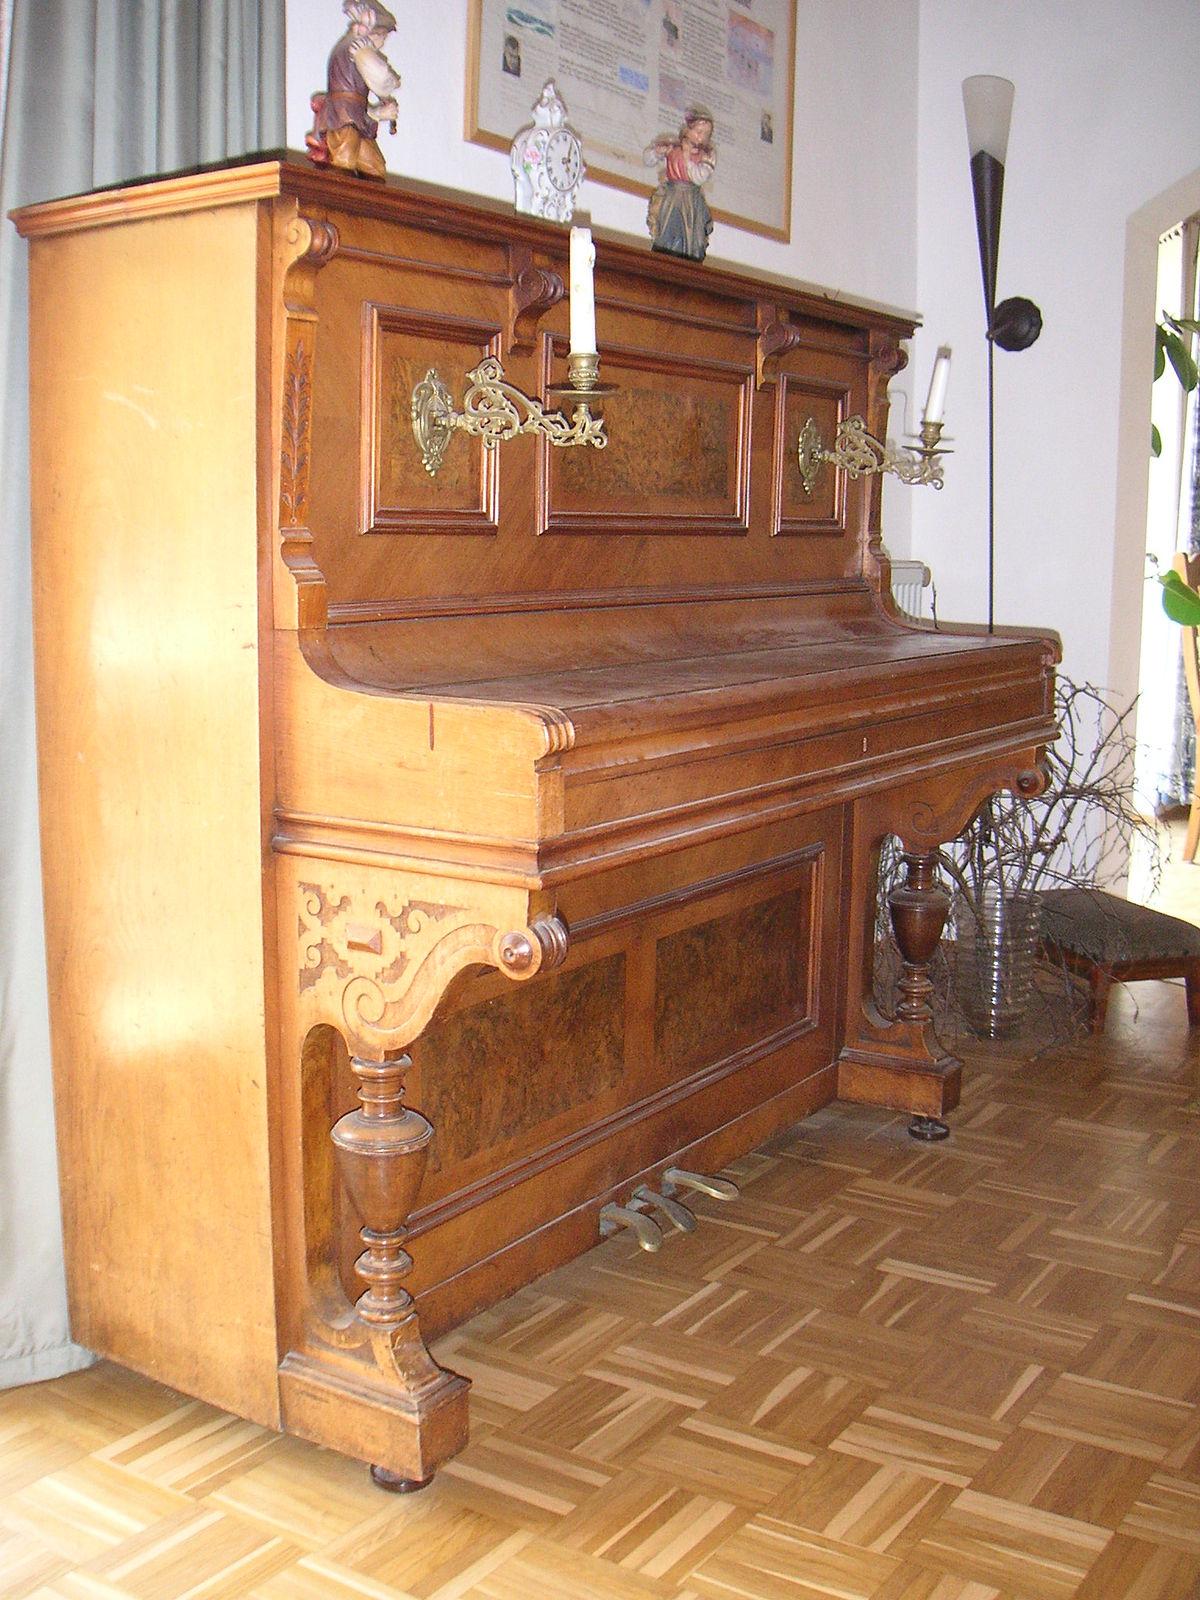 Arab Klavier